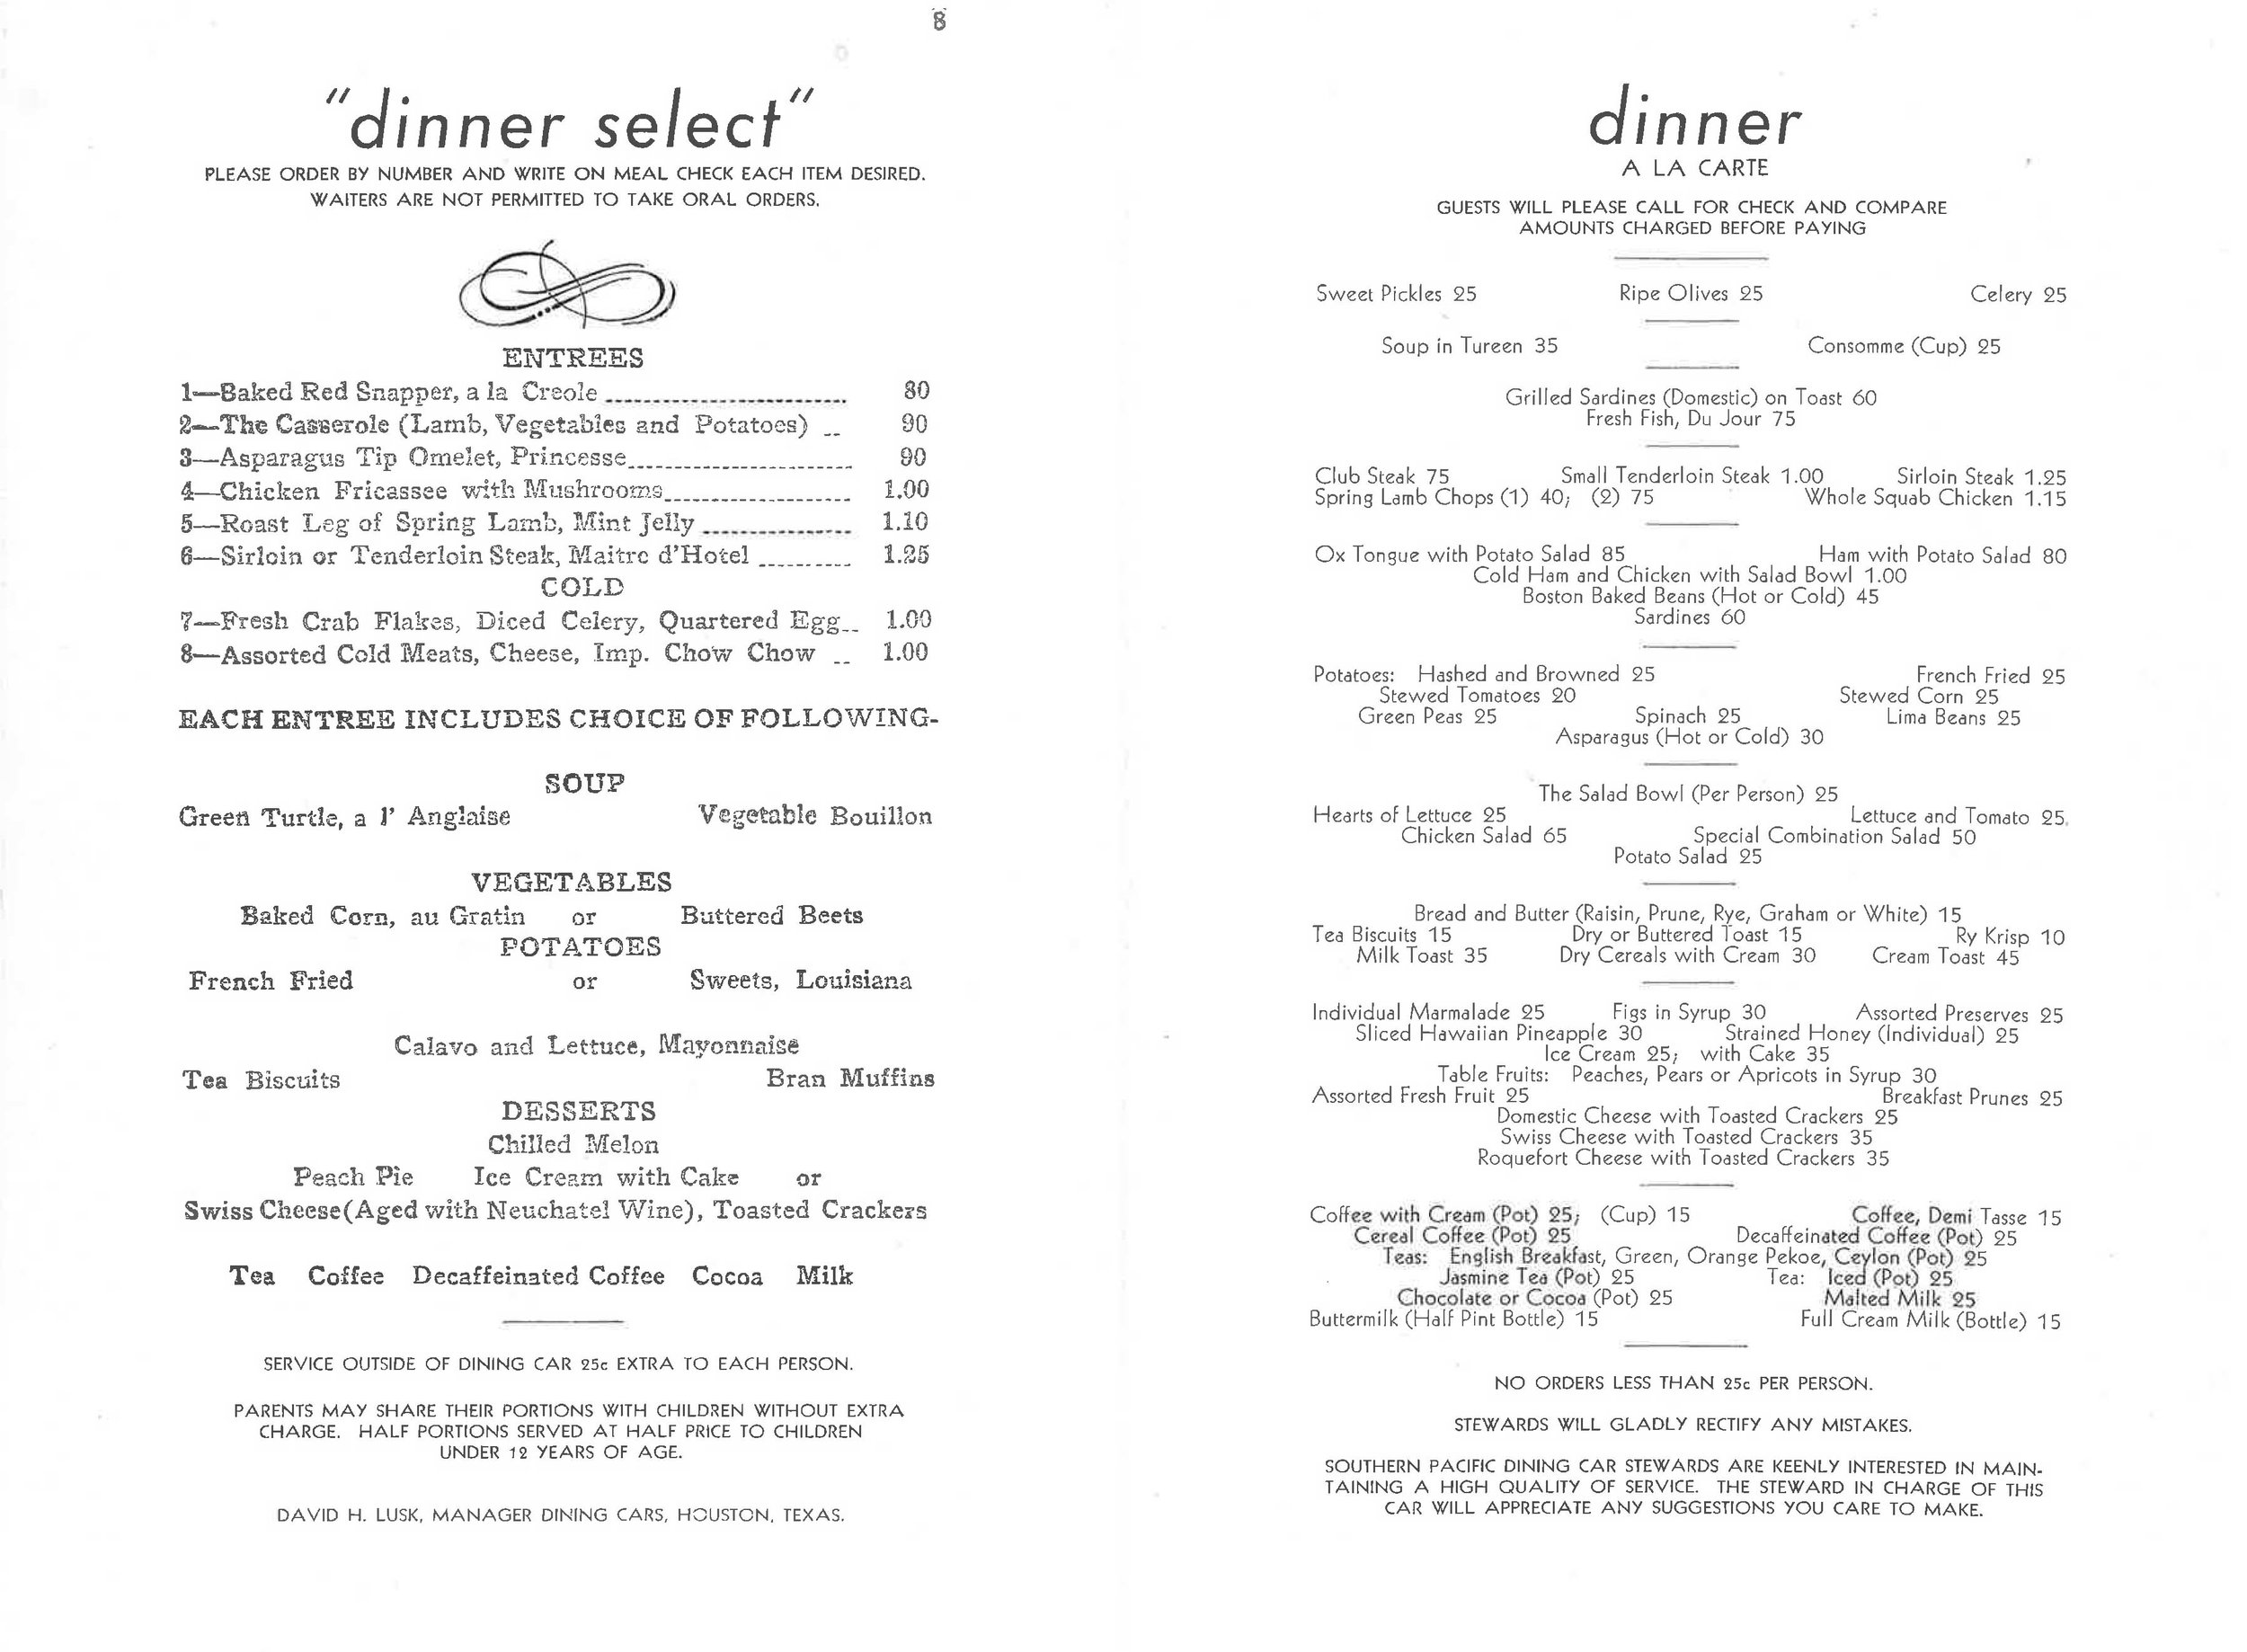 SP+Sunset+Limited+Dinner+Menu 2.jpg